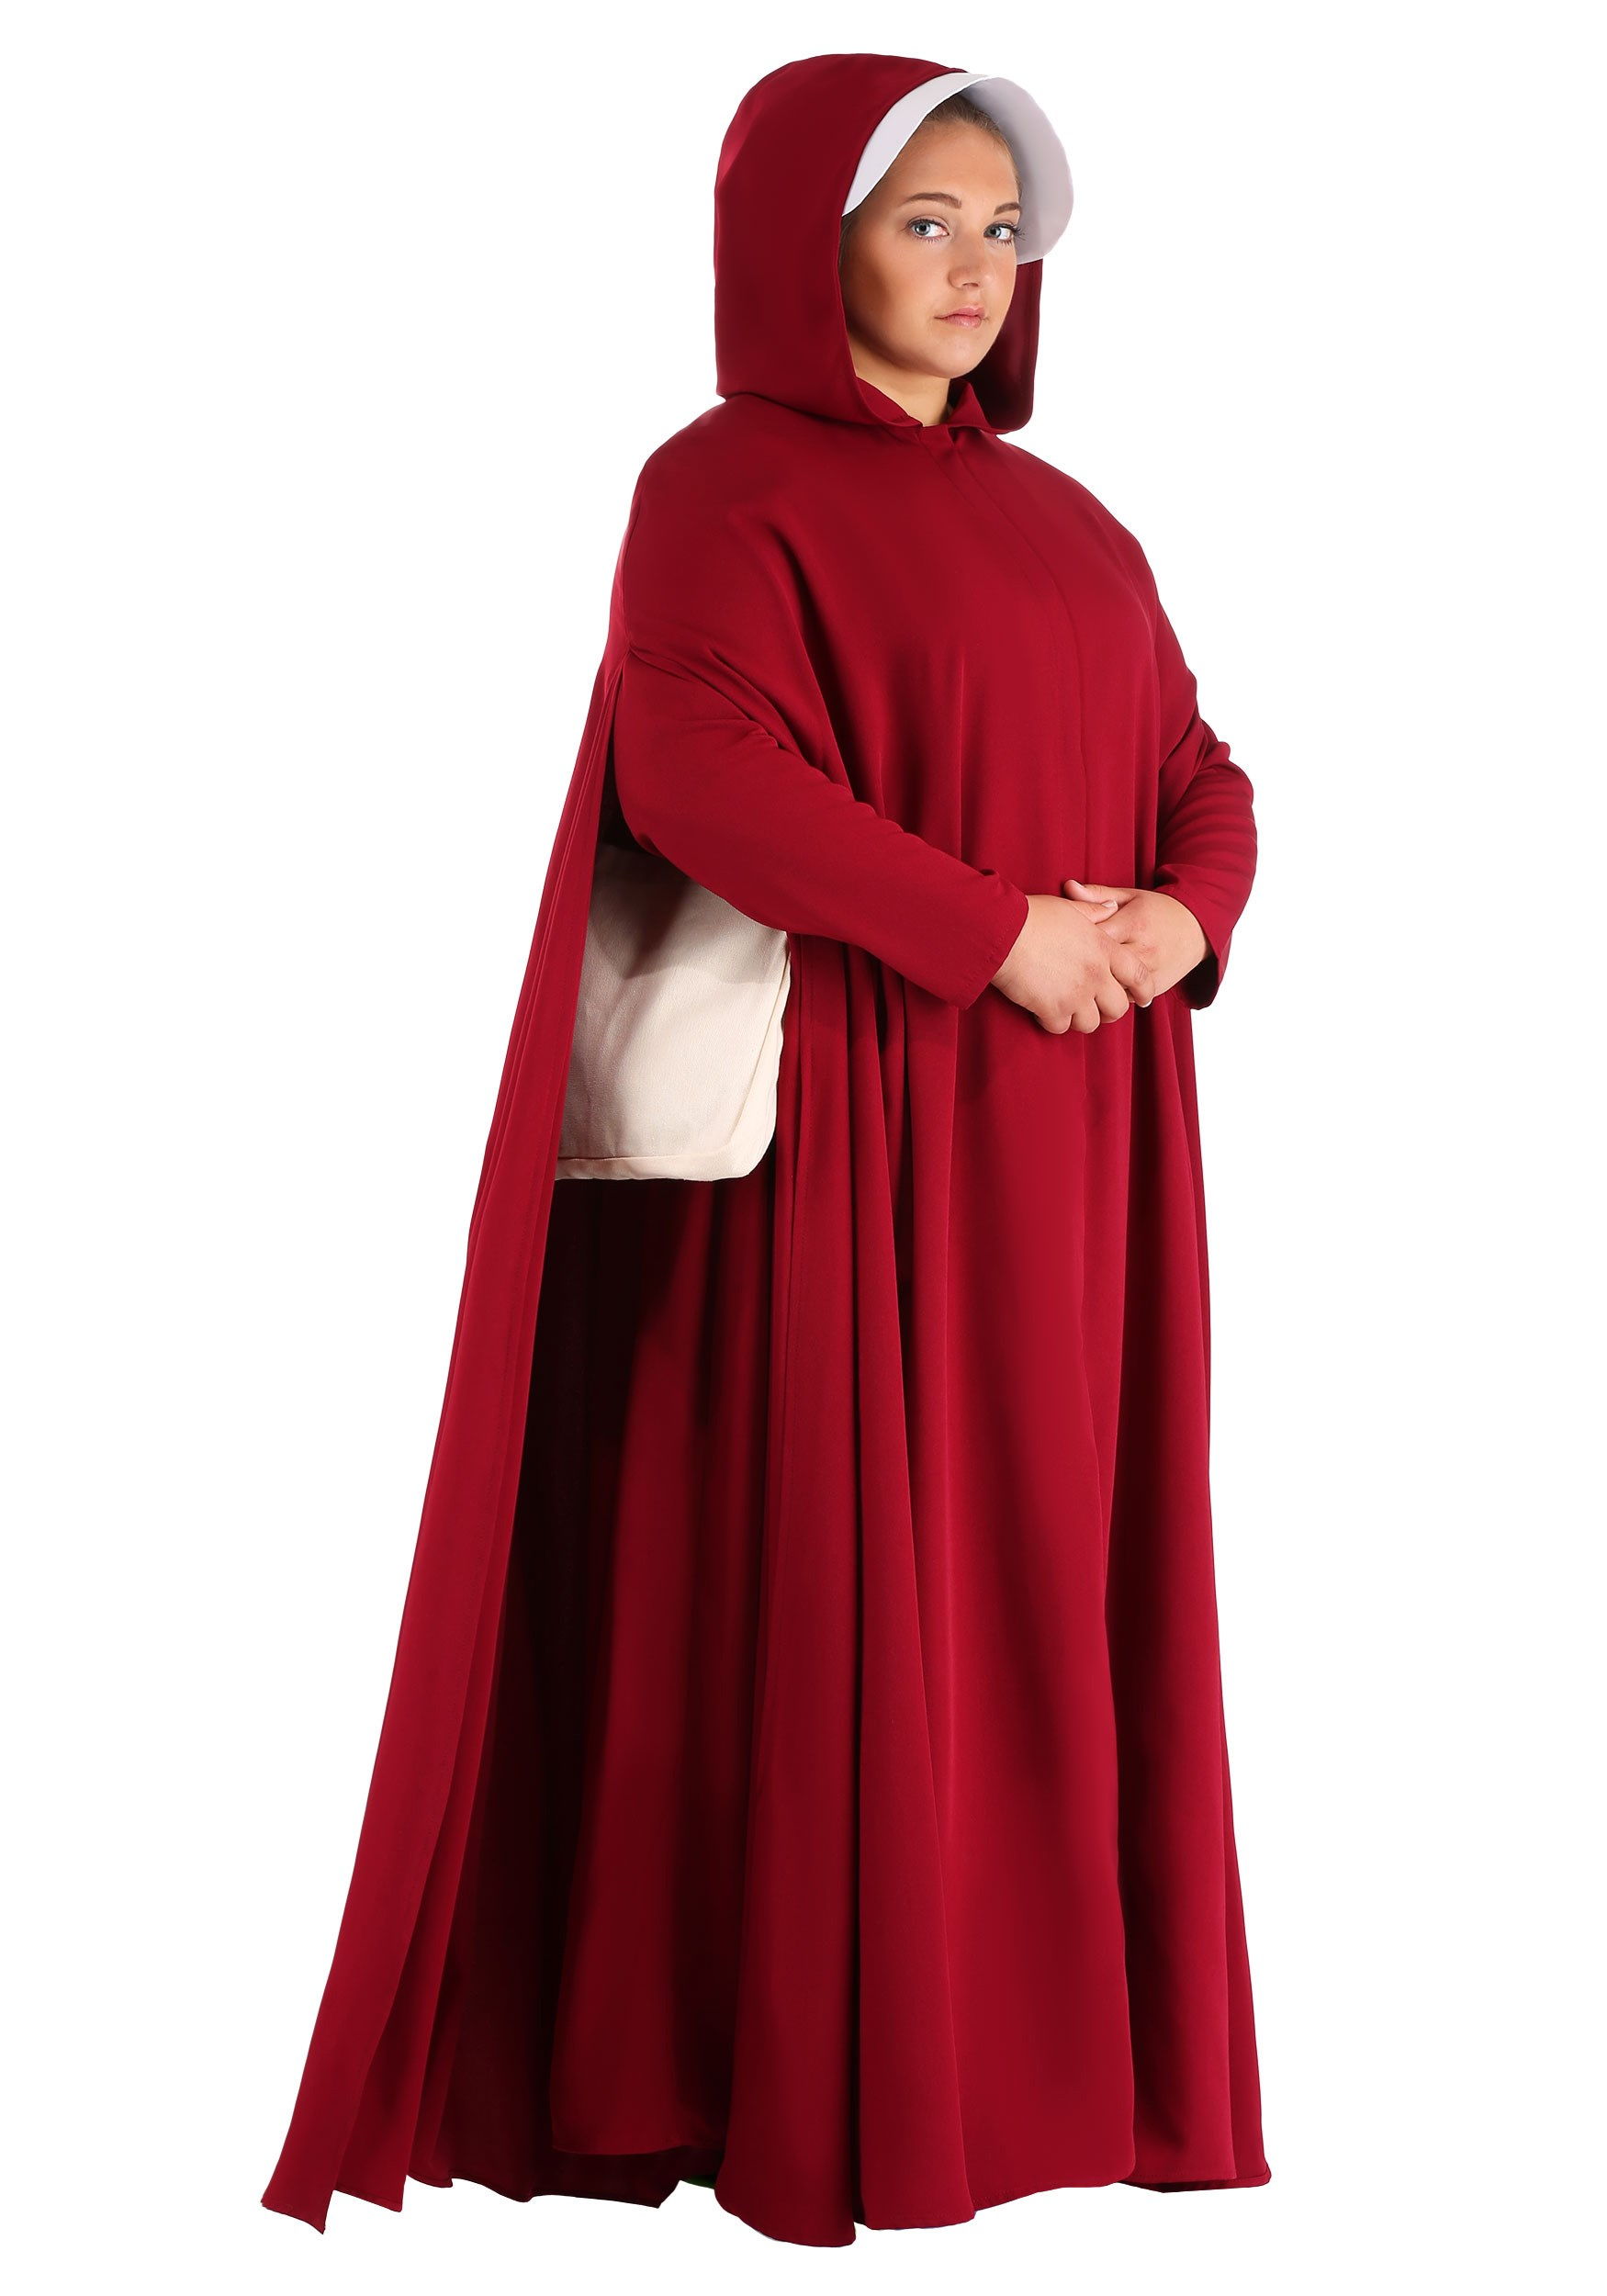 Handmaids Tale Deluxe Plus Size Costume For Women